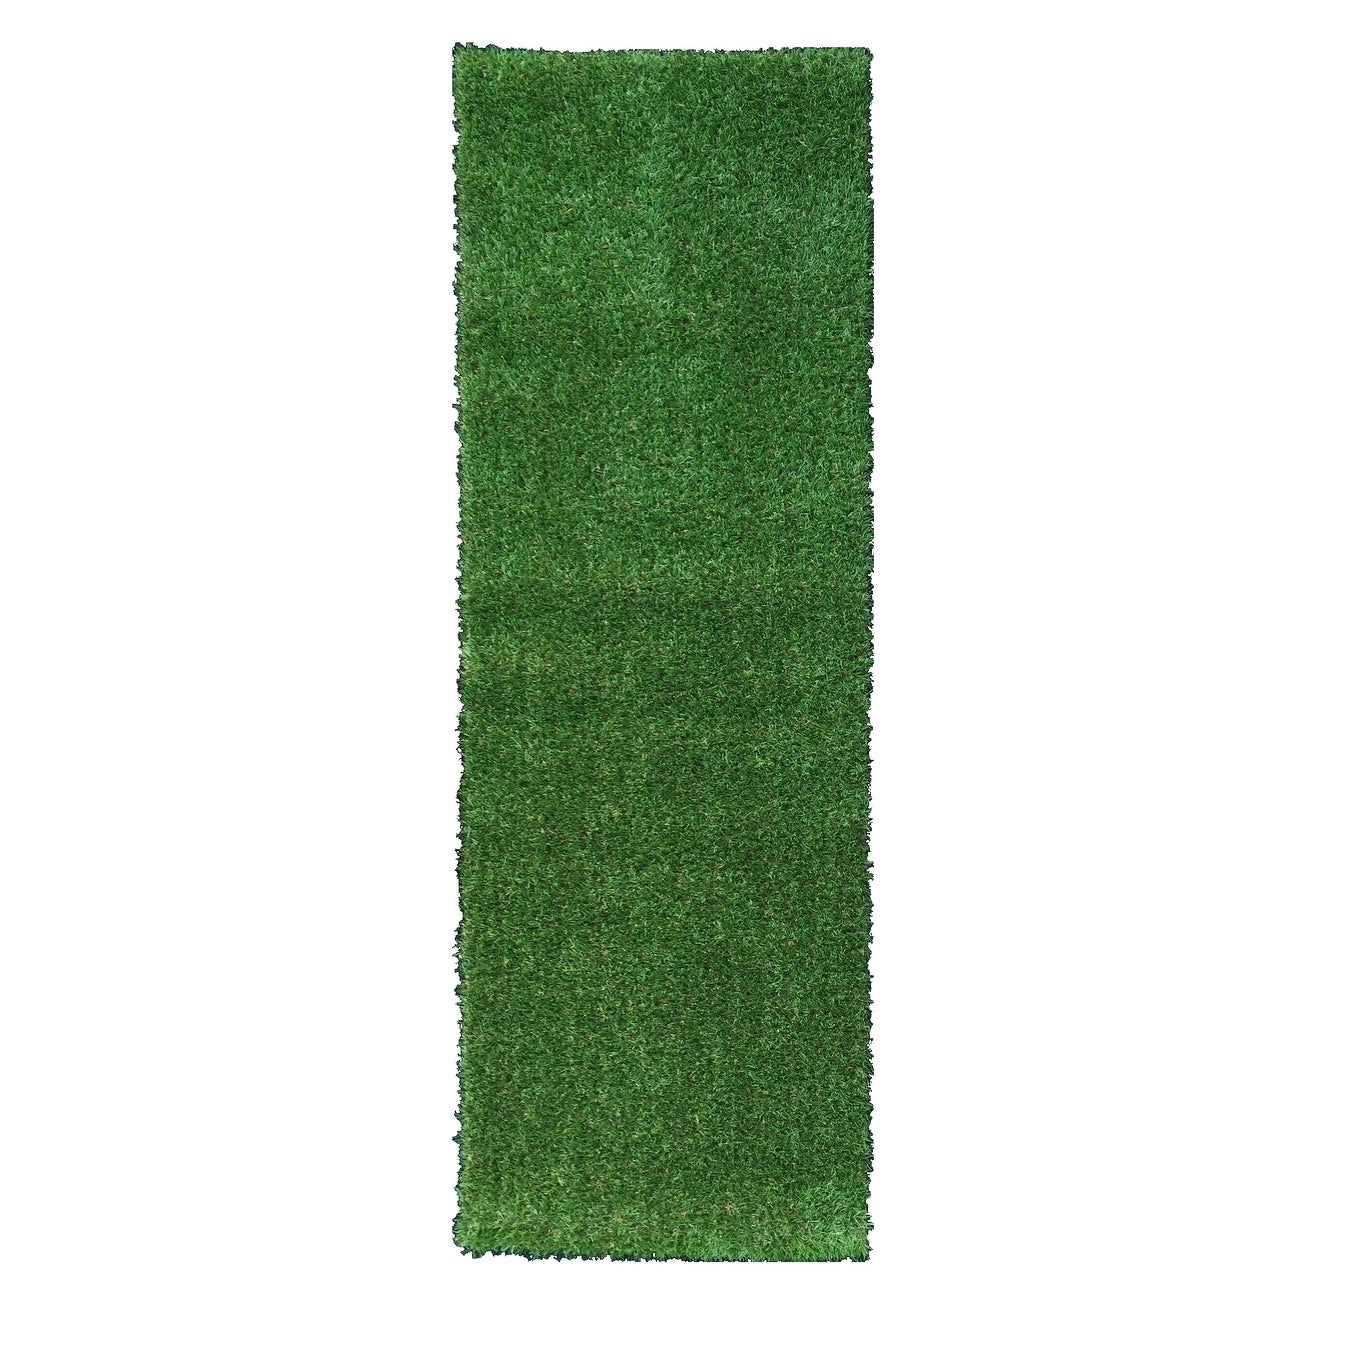 Berrnour Home Indoor/Outdoor Green Artificial Grass Runne...